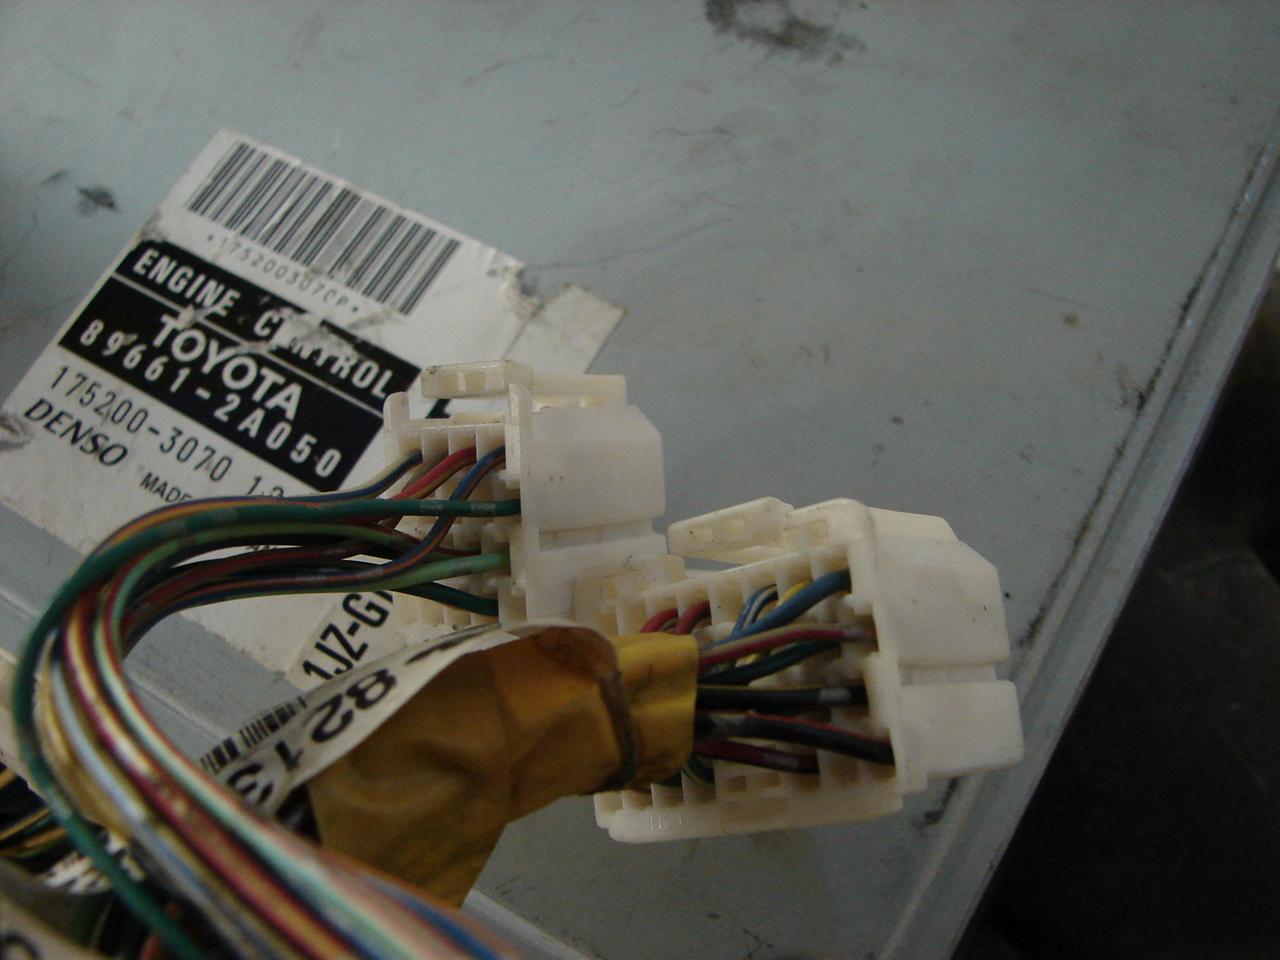 1jz vvti wiring diagram pdf 2002 chevy suburban radio wrg 6981 toyota chaser jzx100 gte need ecu pinout pics inside